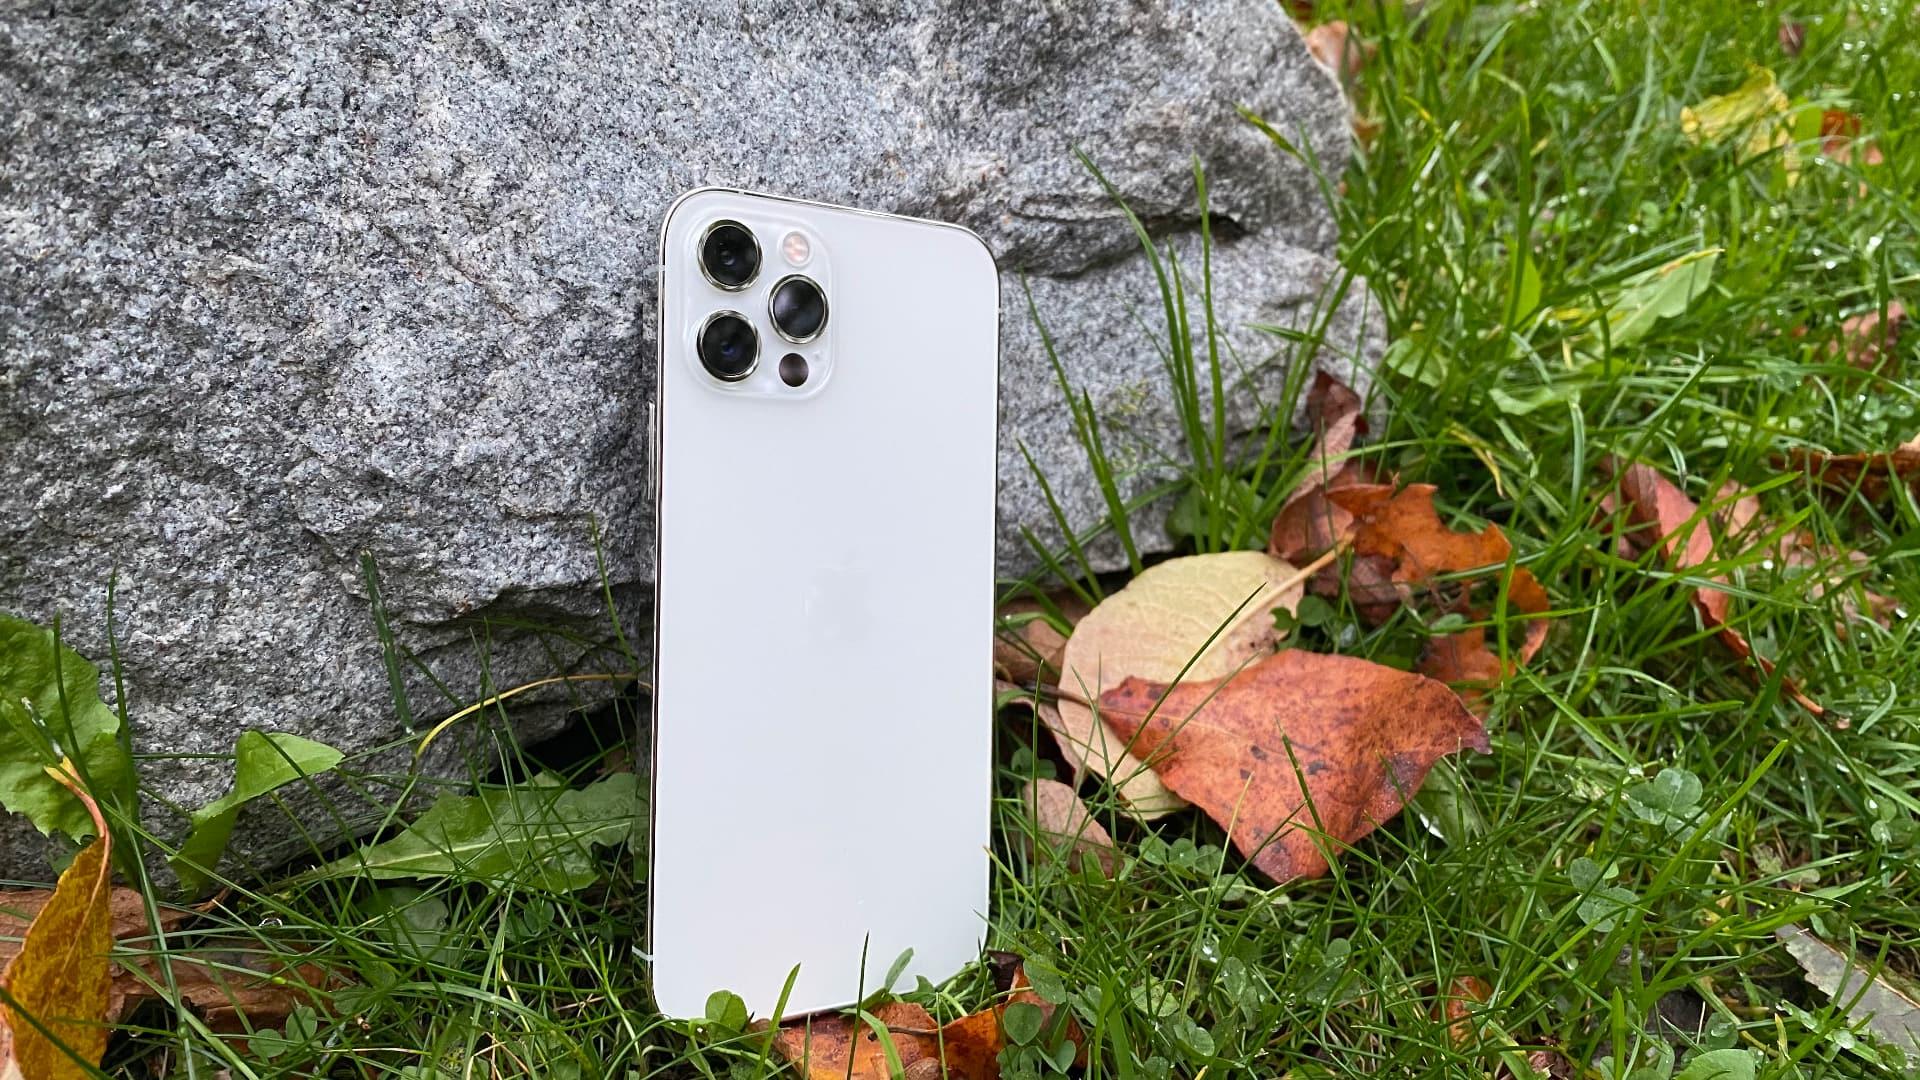 Iphone 12 Pro, Silver, sten, baksida